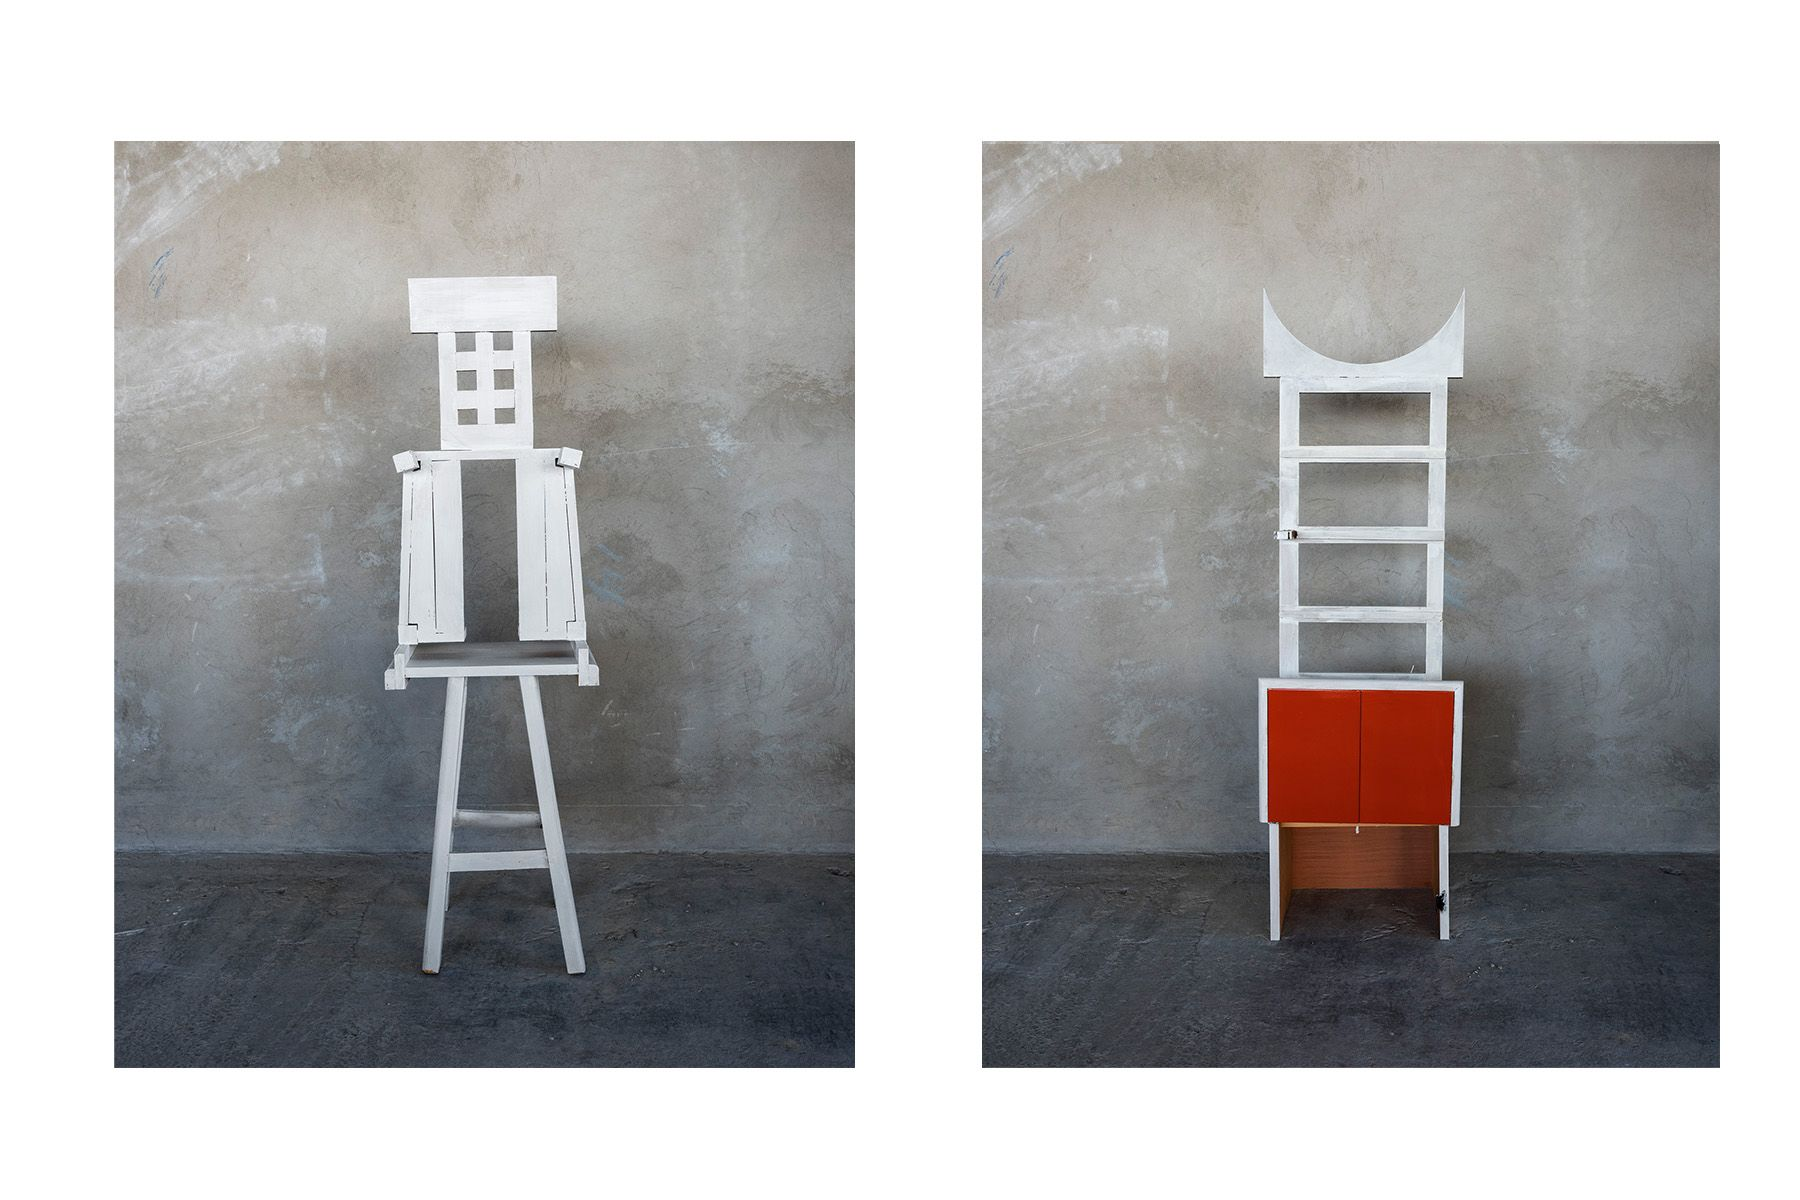 Furniture Totem (#8 left, #3, right)